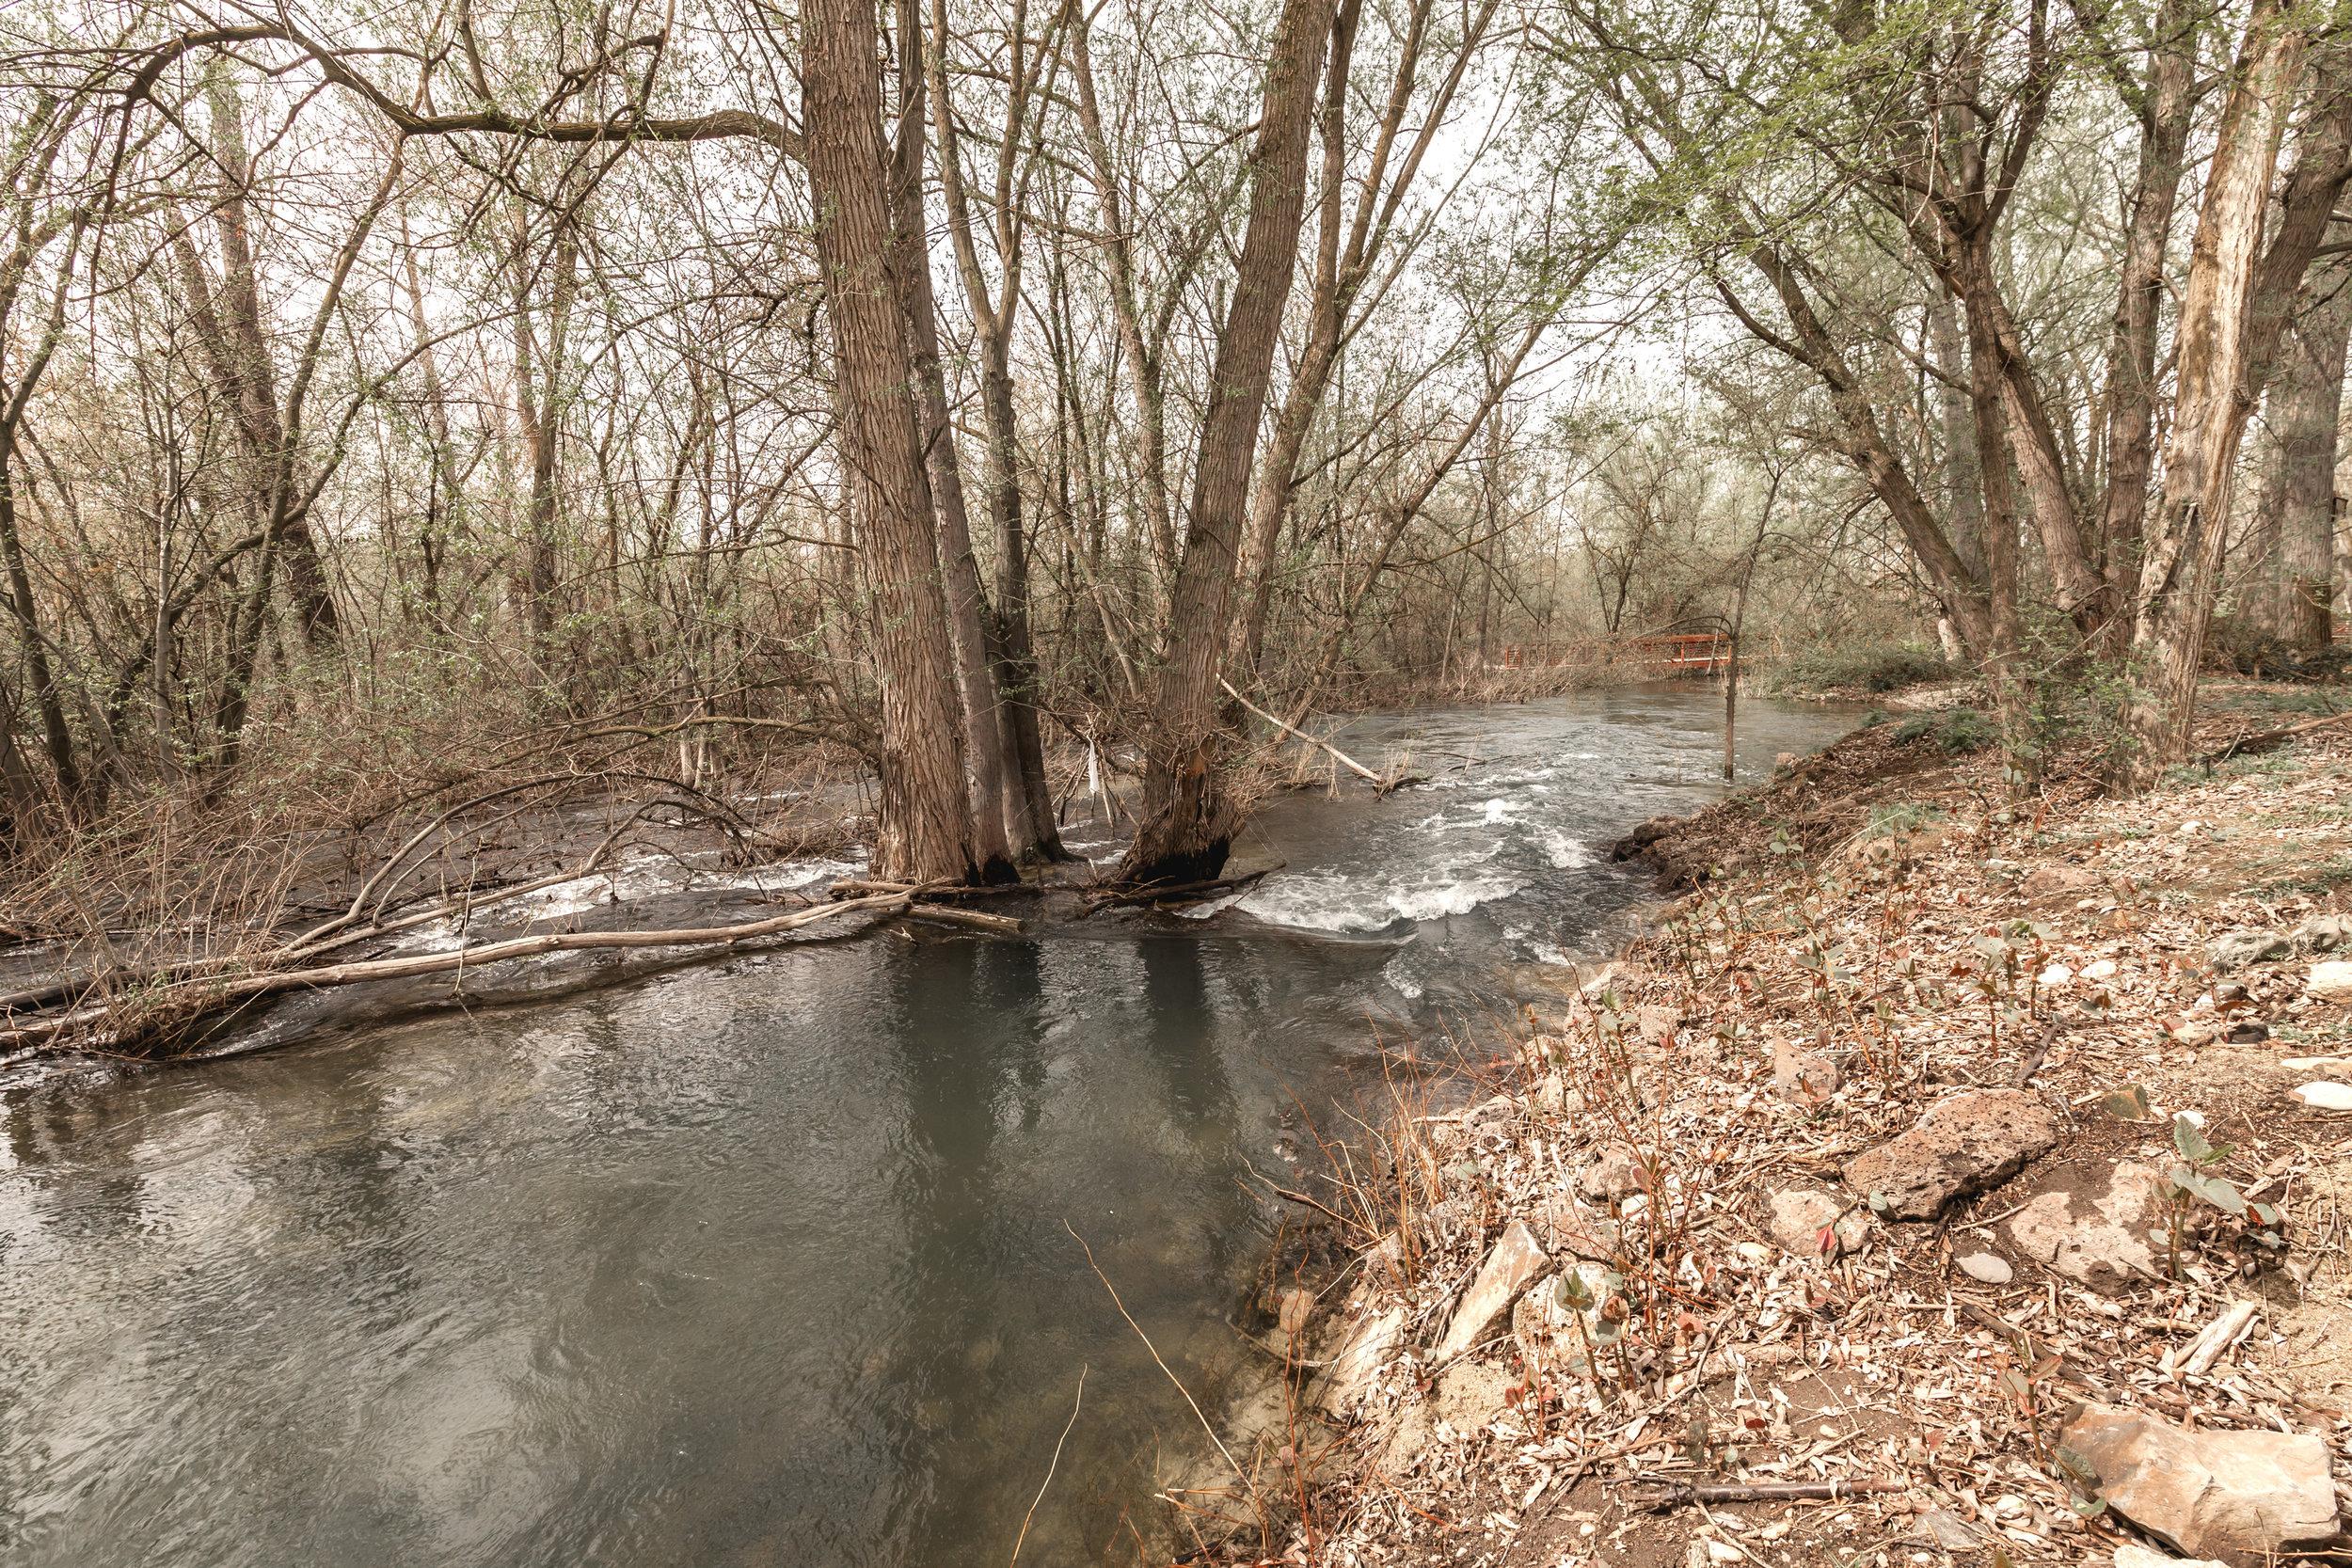 Exterior-River-View2.jpg